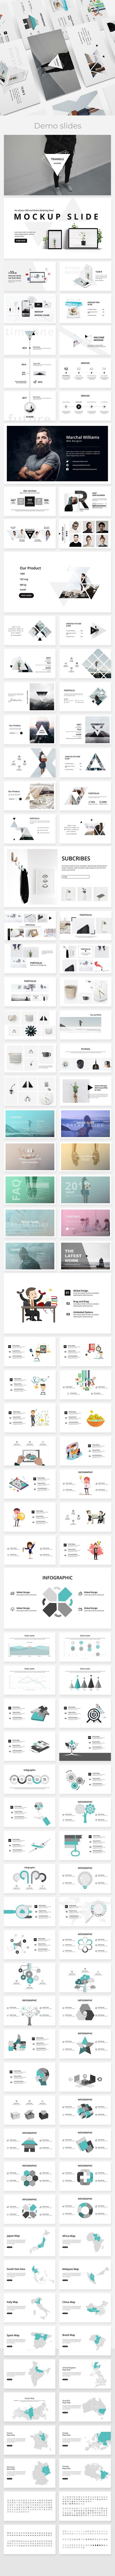 #Triangle #Minimal Google Slide Template - #Google Slides Presentation Templates